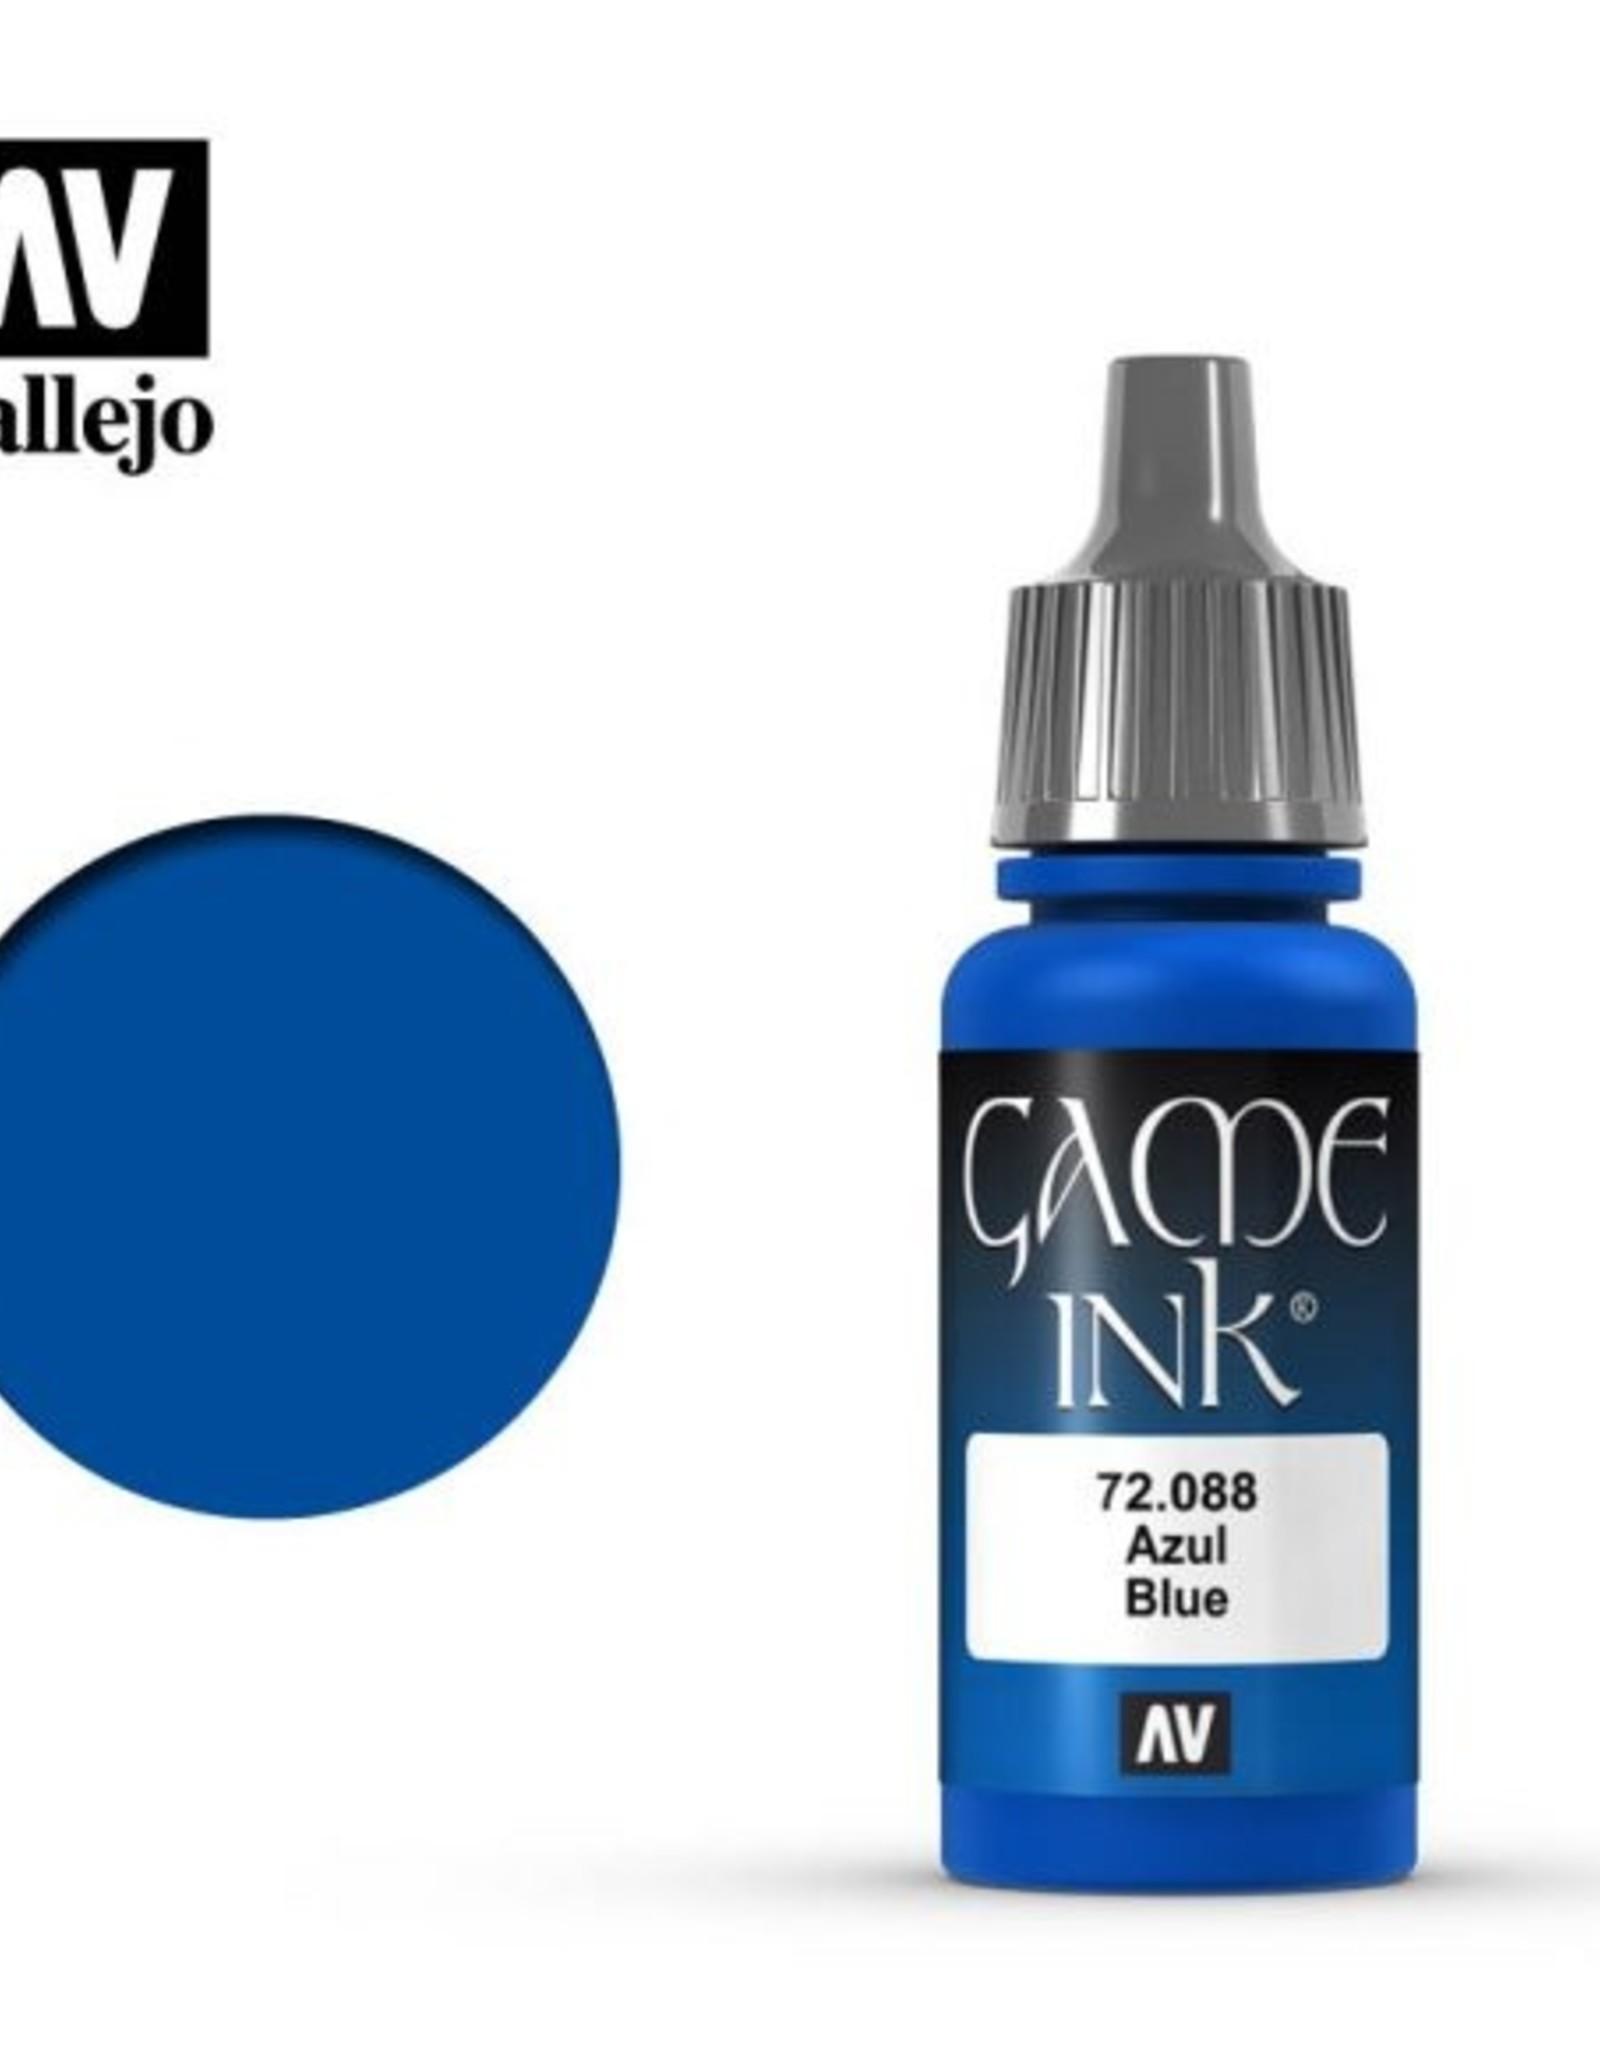 Vallejo 72.088 Blue Ink